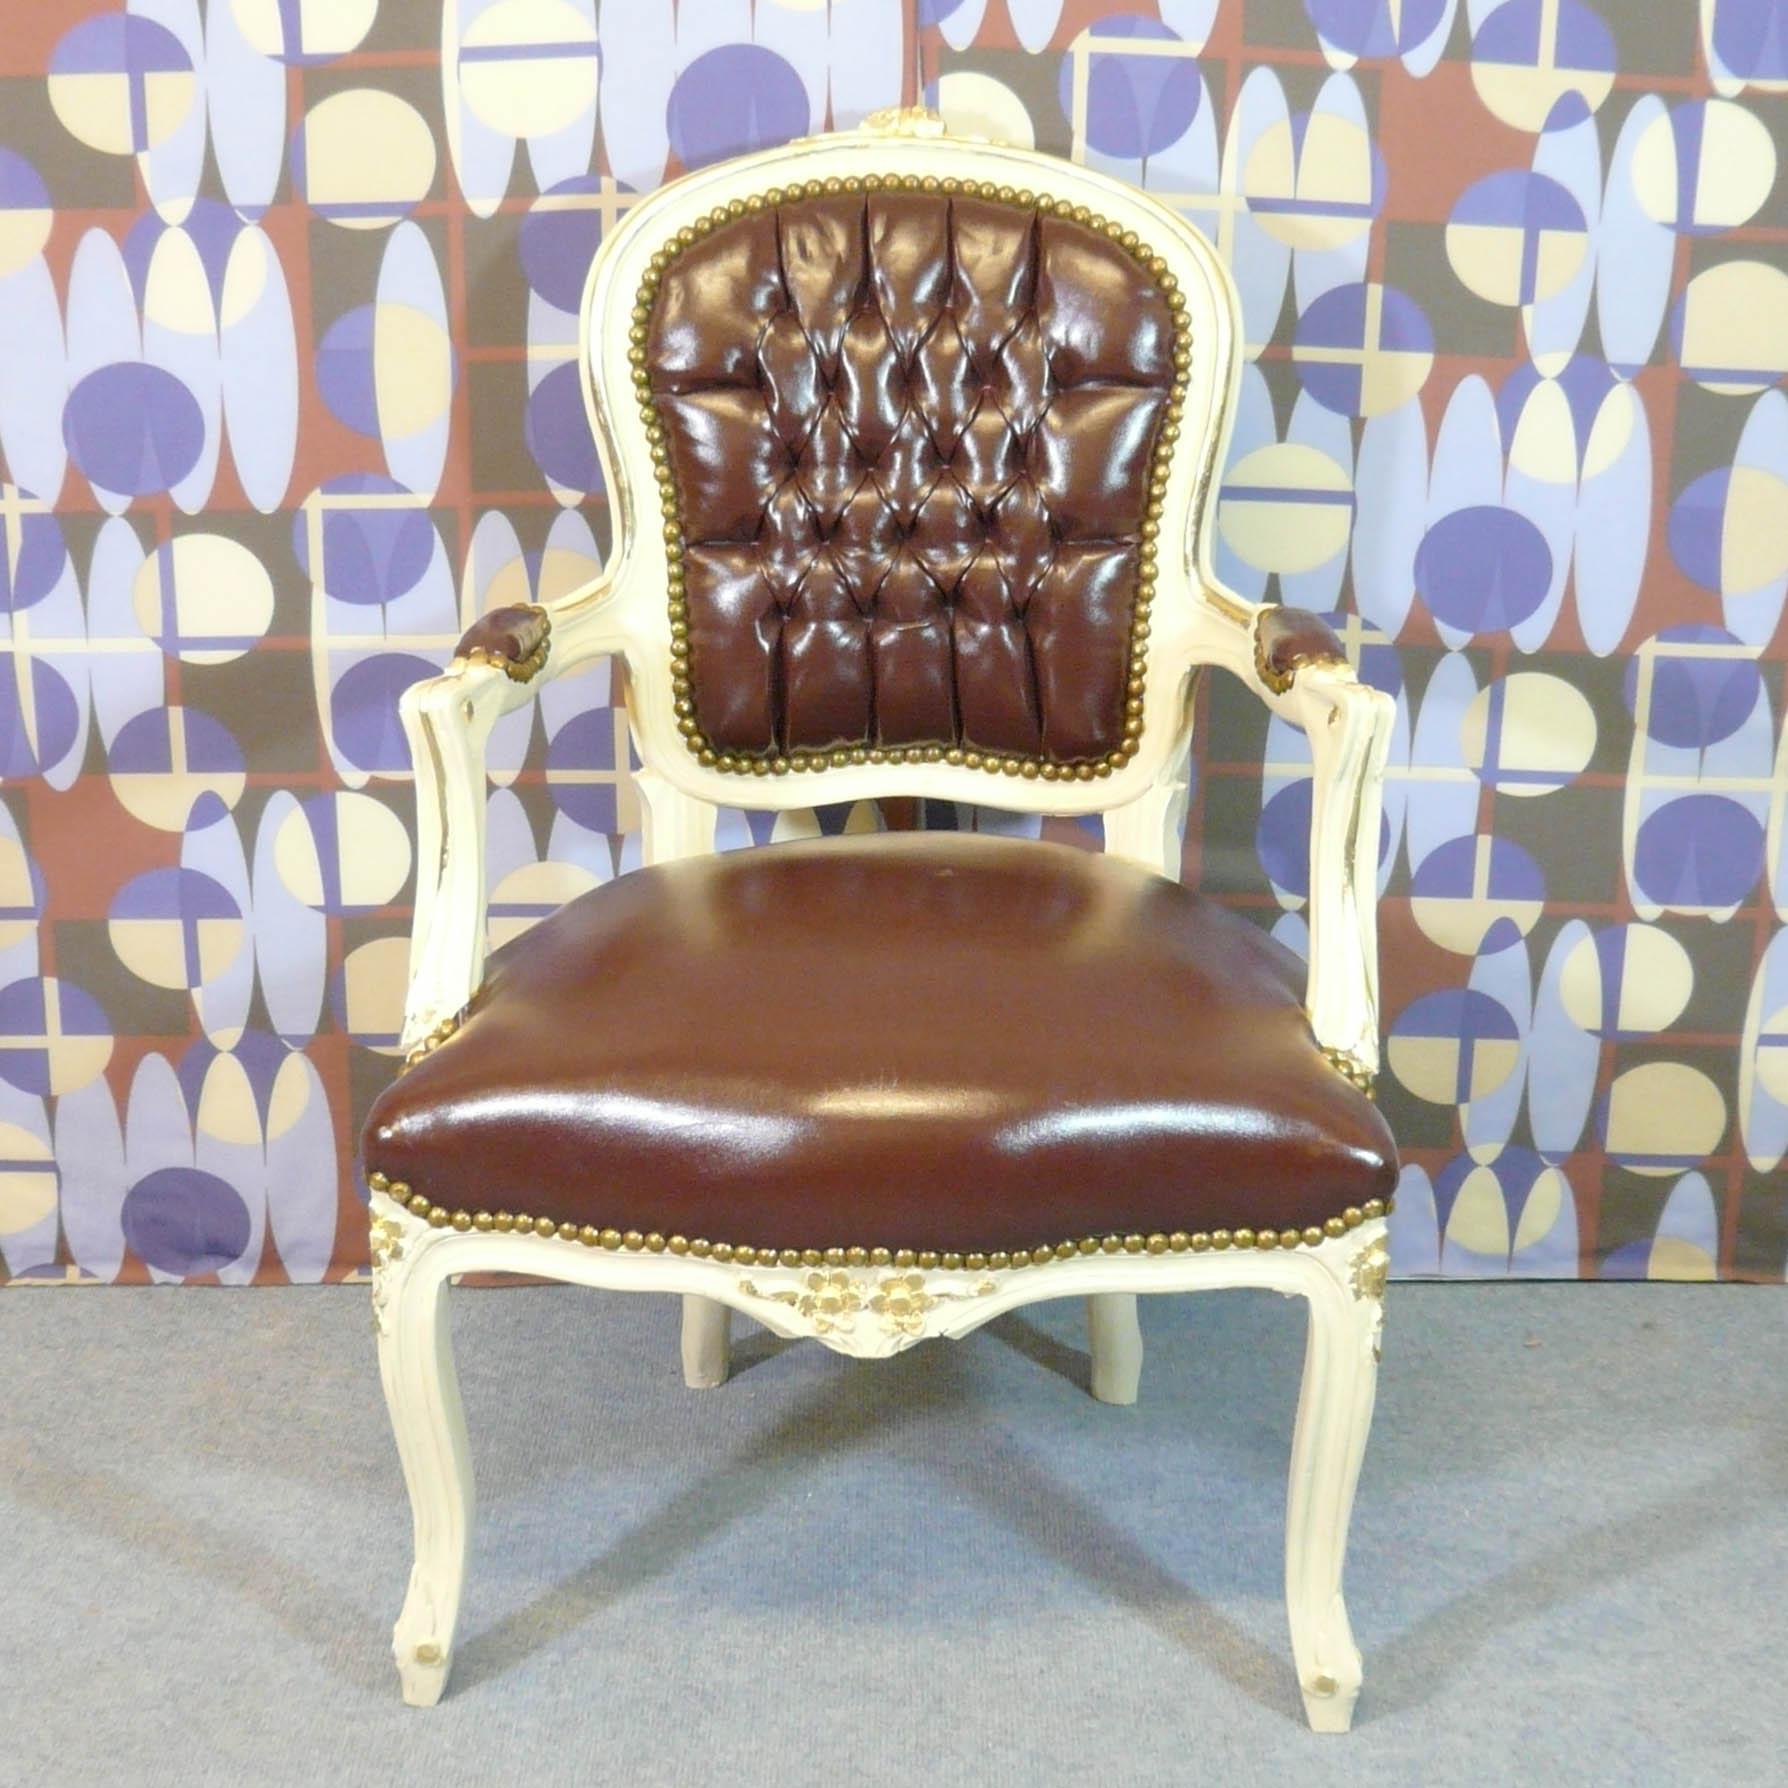 fauteuil baroque style louis xv meubles art d co lampe tiffany fauteuil baroque vase m dicis. Black Bedroom Furniture Sets. Home Design Ideas